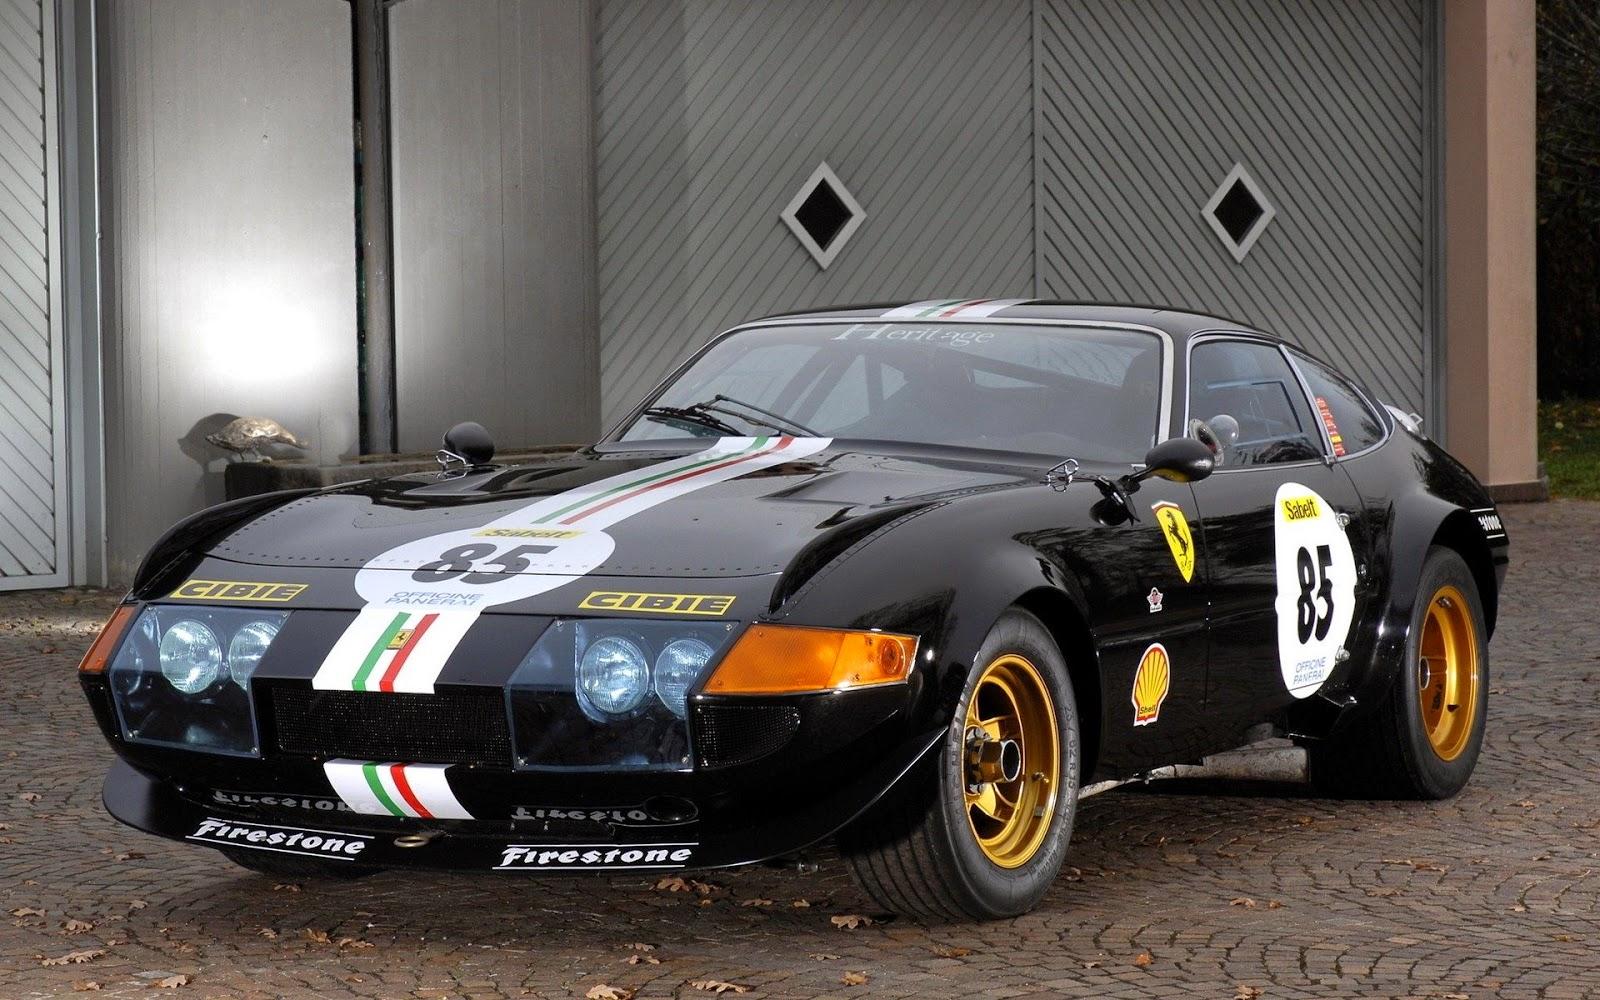 http://carbrandsincurrentproduction.blogspot.com.es/search/label/Ferrari Daytona Replica